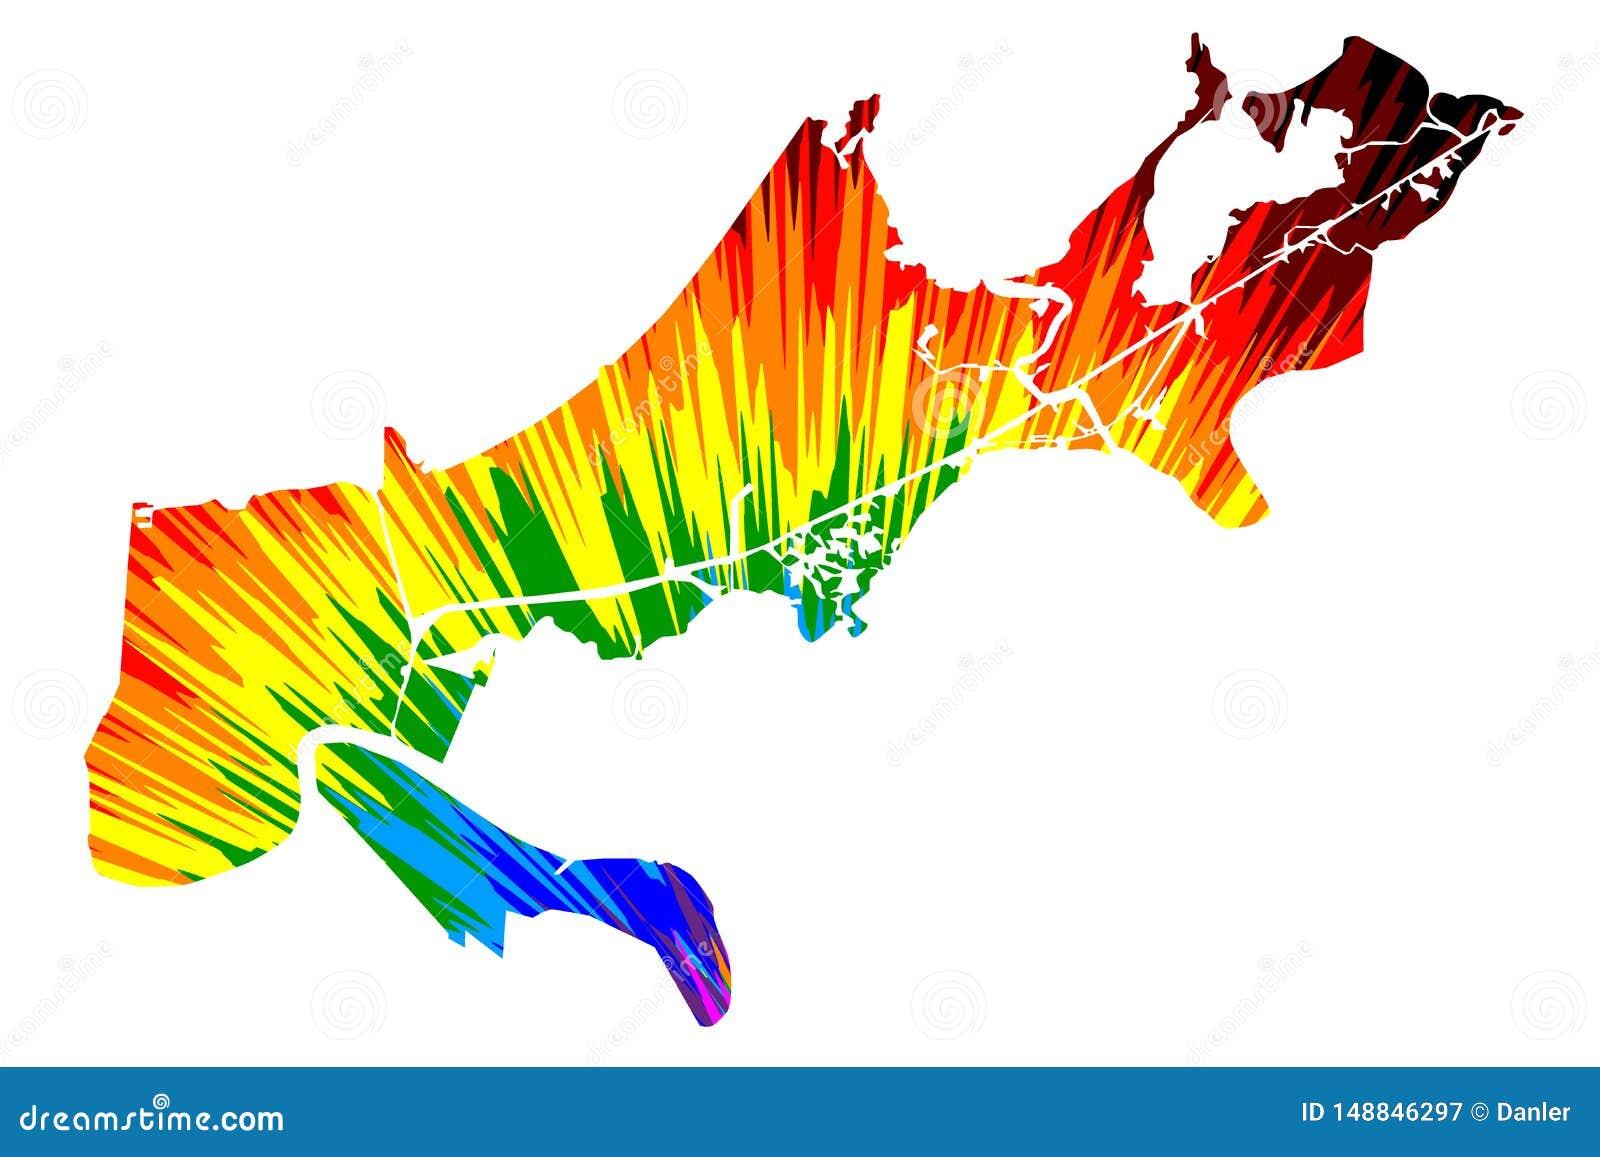 New Orleans City United States Of America, USA, U.S., US ...